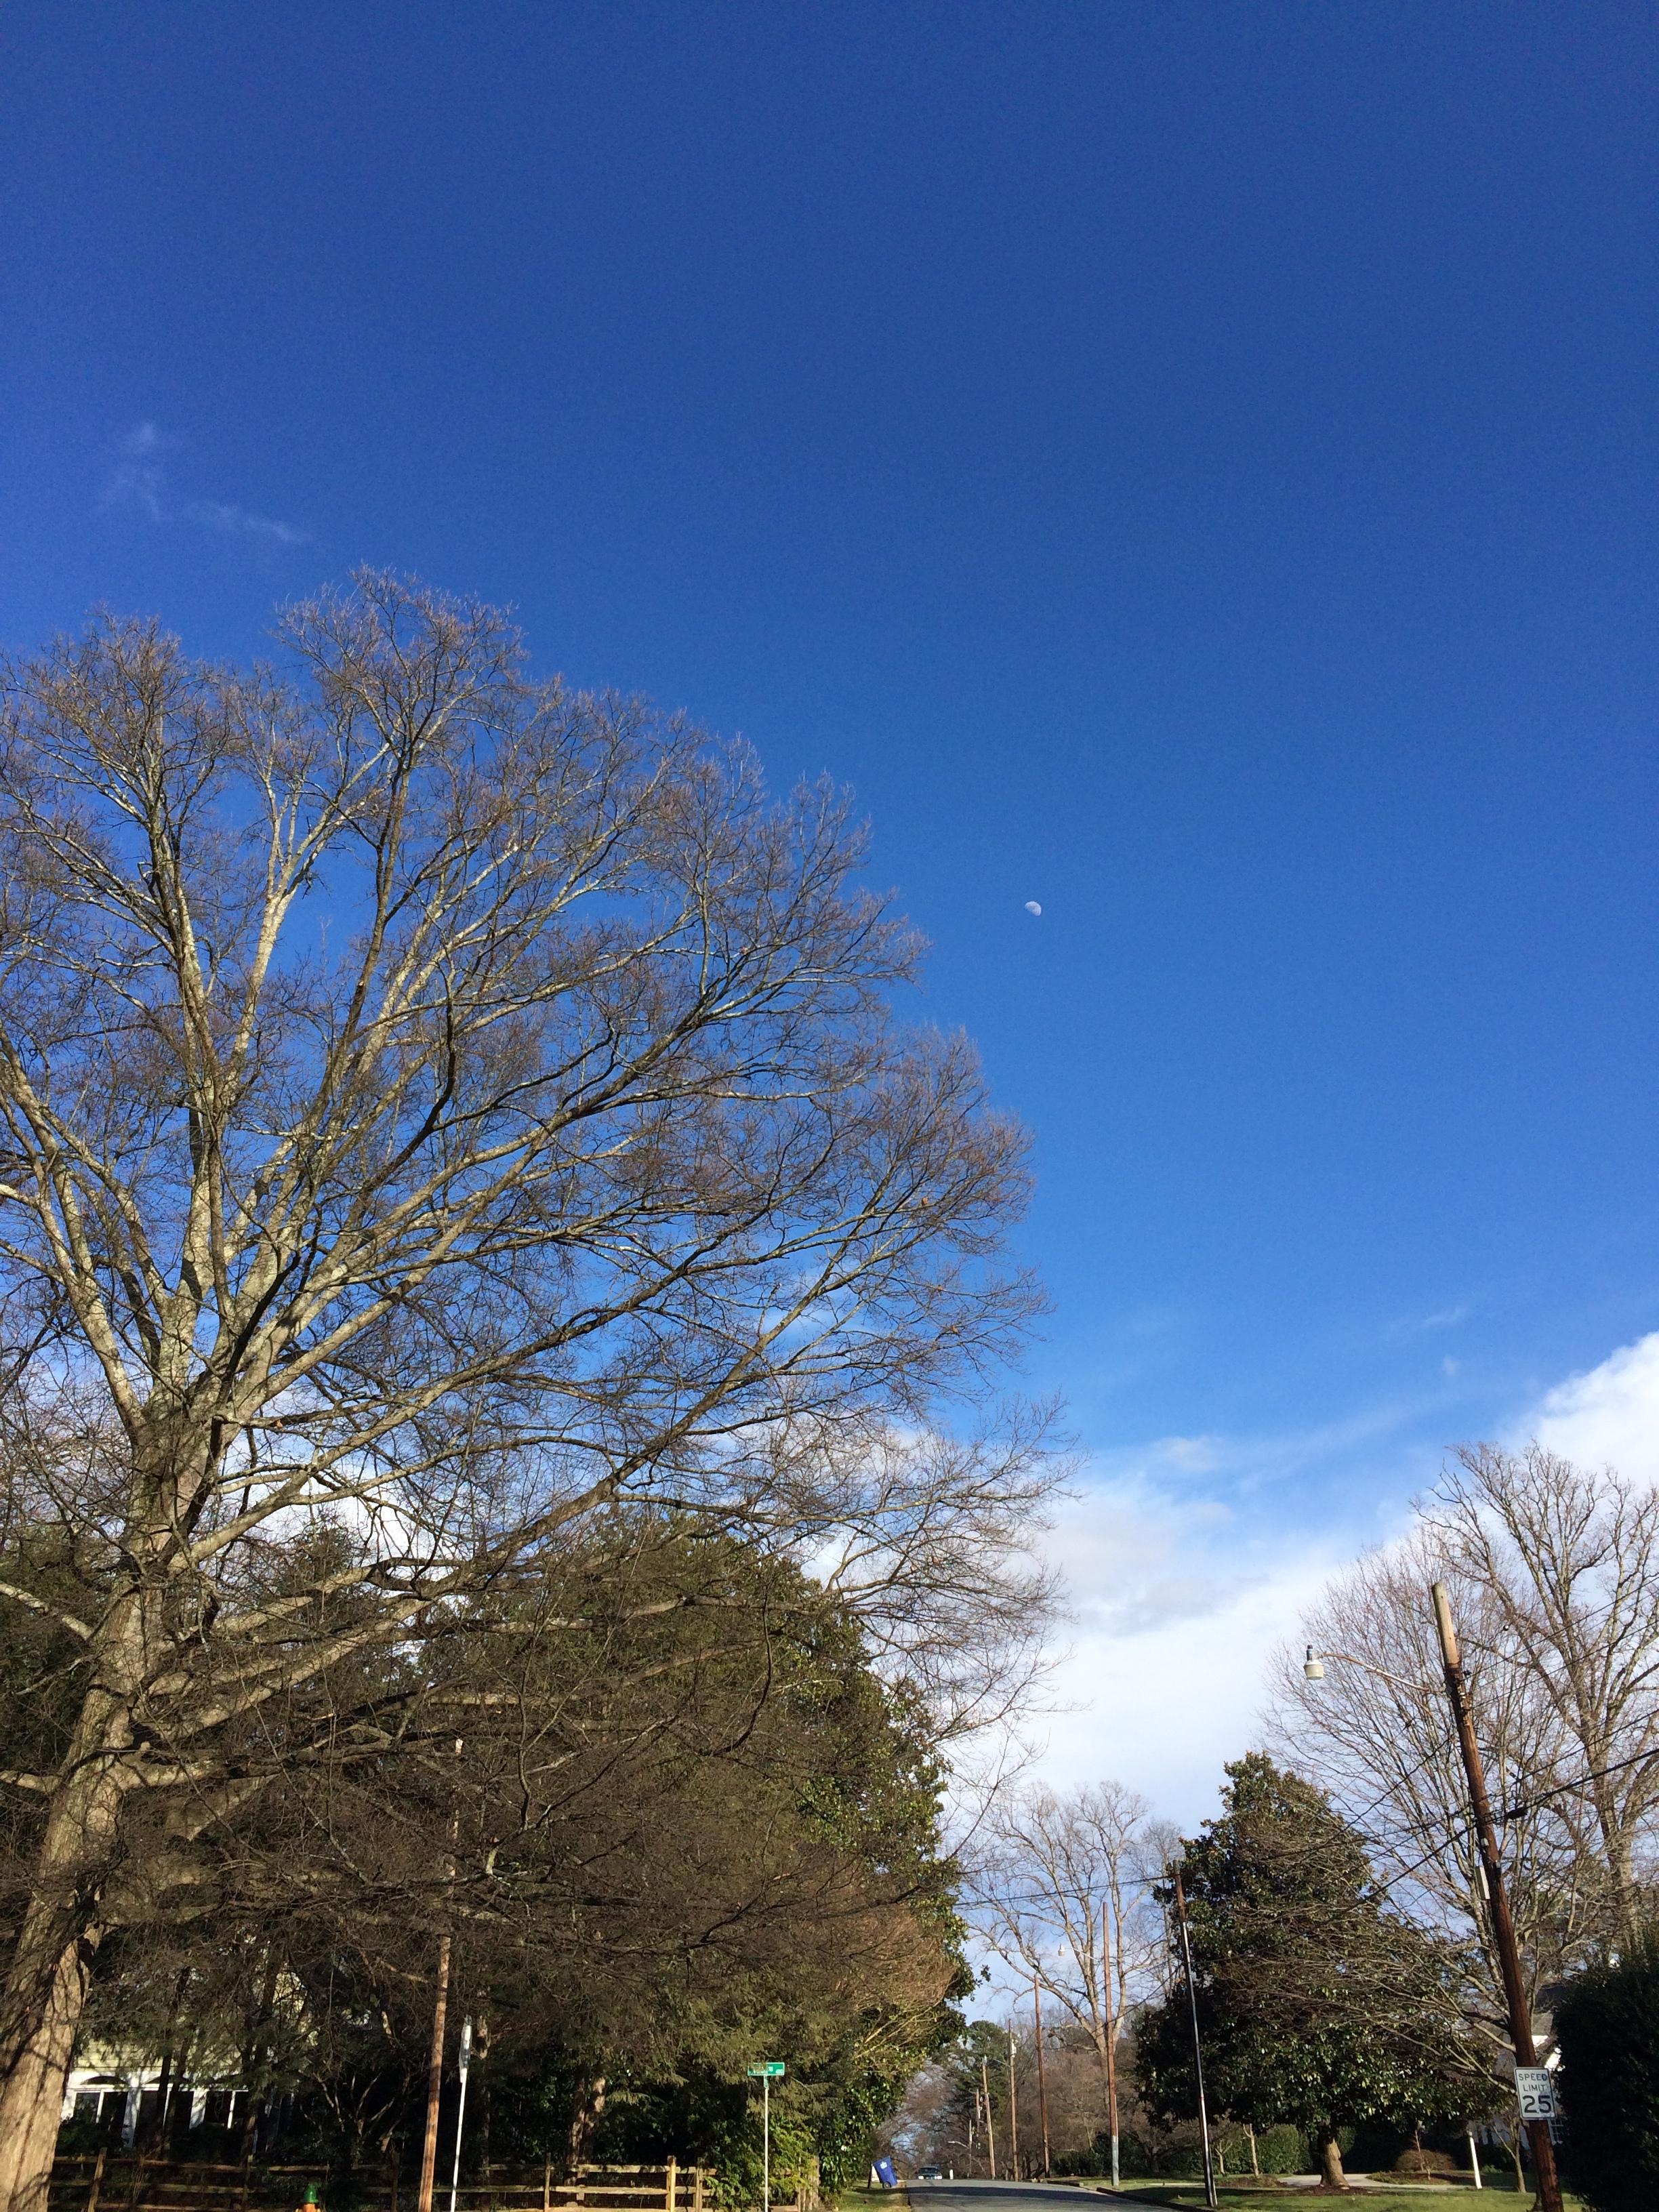 a beautiful day last week